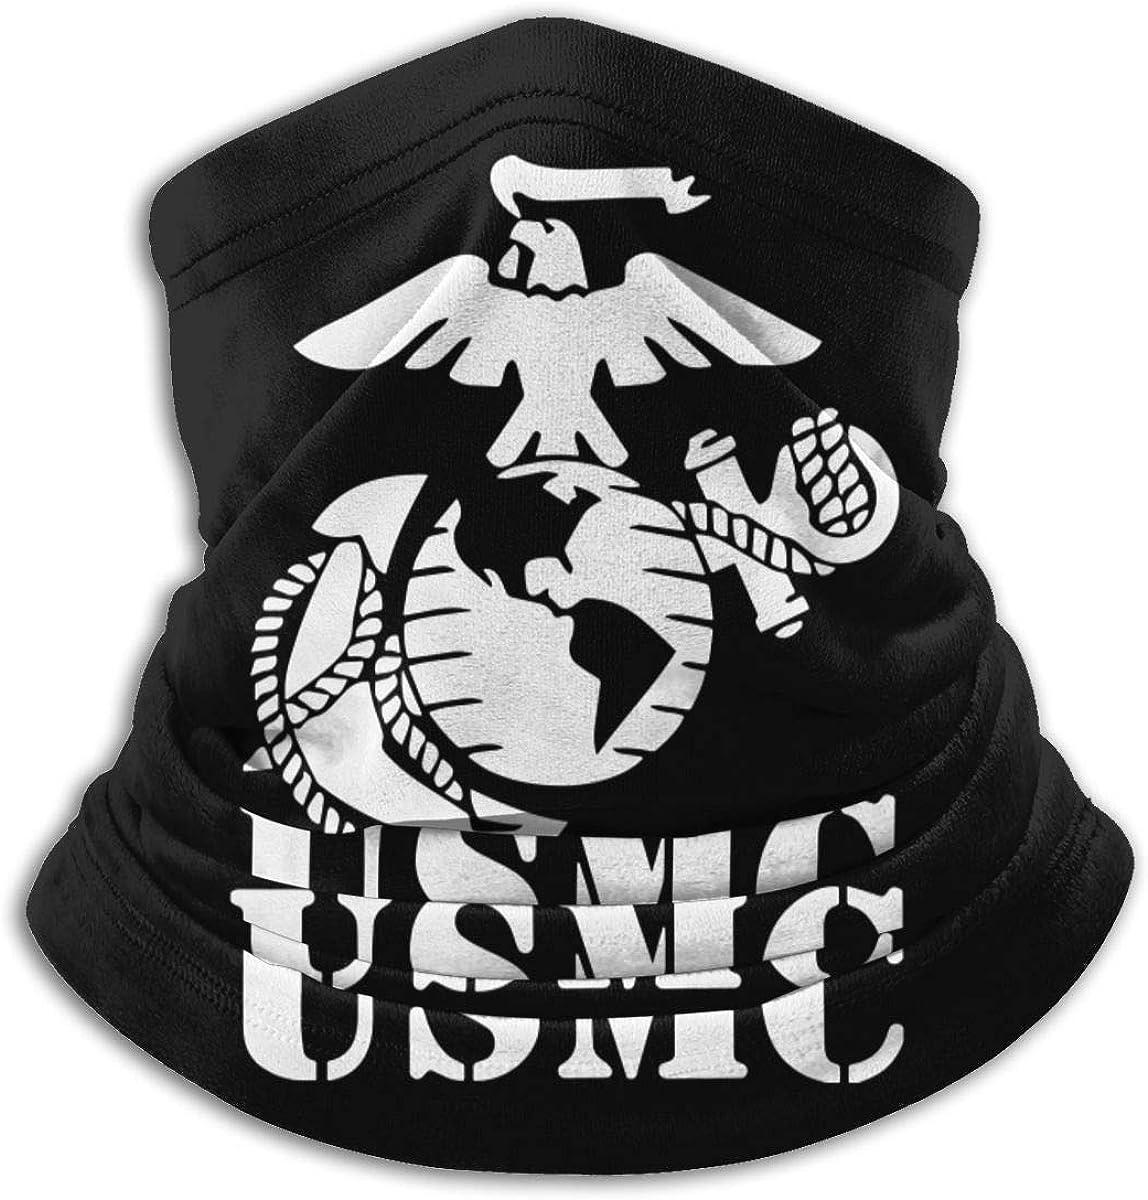 Eagle Globe Anchor USMC Calentador de cuello Bufanda Polaina Mascarilla Bandanas para polvo Clima frío Invierno al aire libre Festivales Deportes para hombres y mujeres